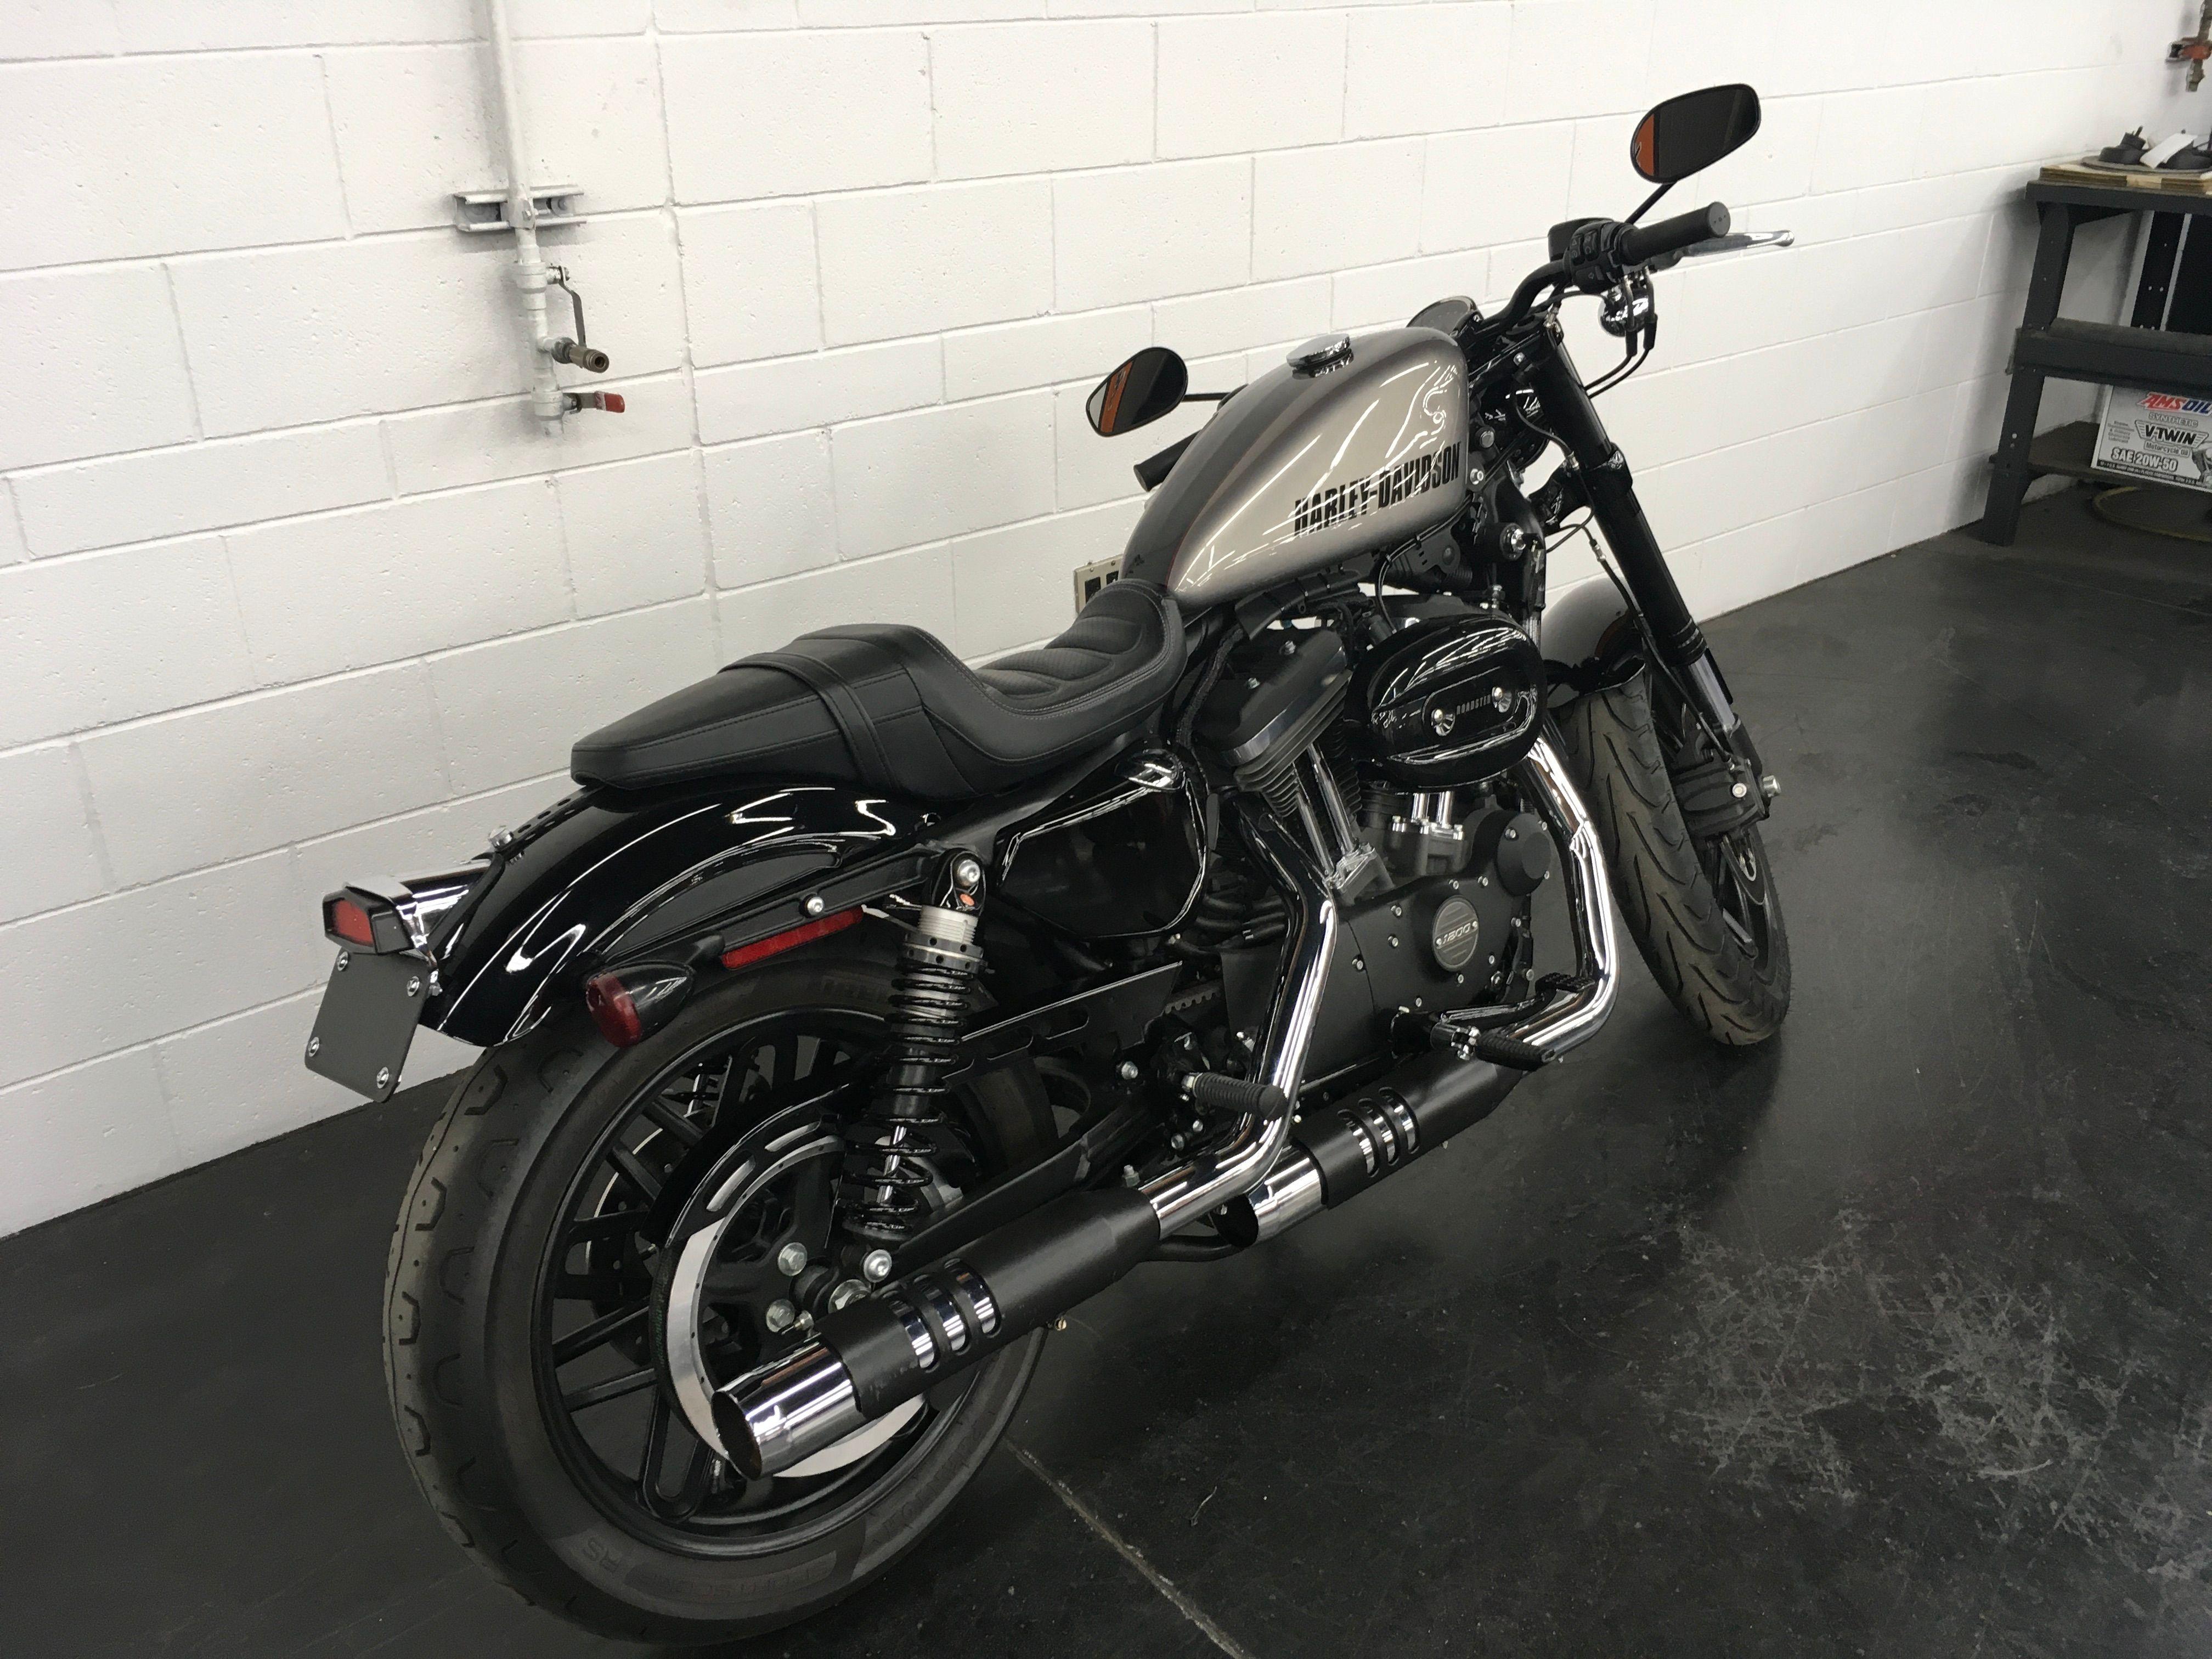 Pre-Owned 2016 Harley-Davidson Roadster